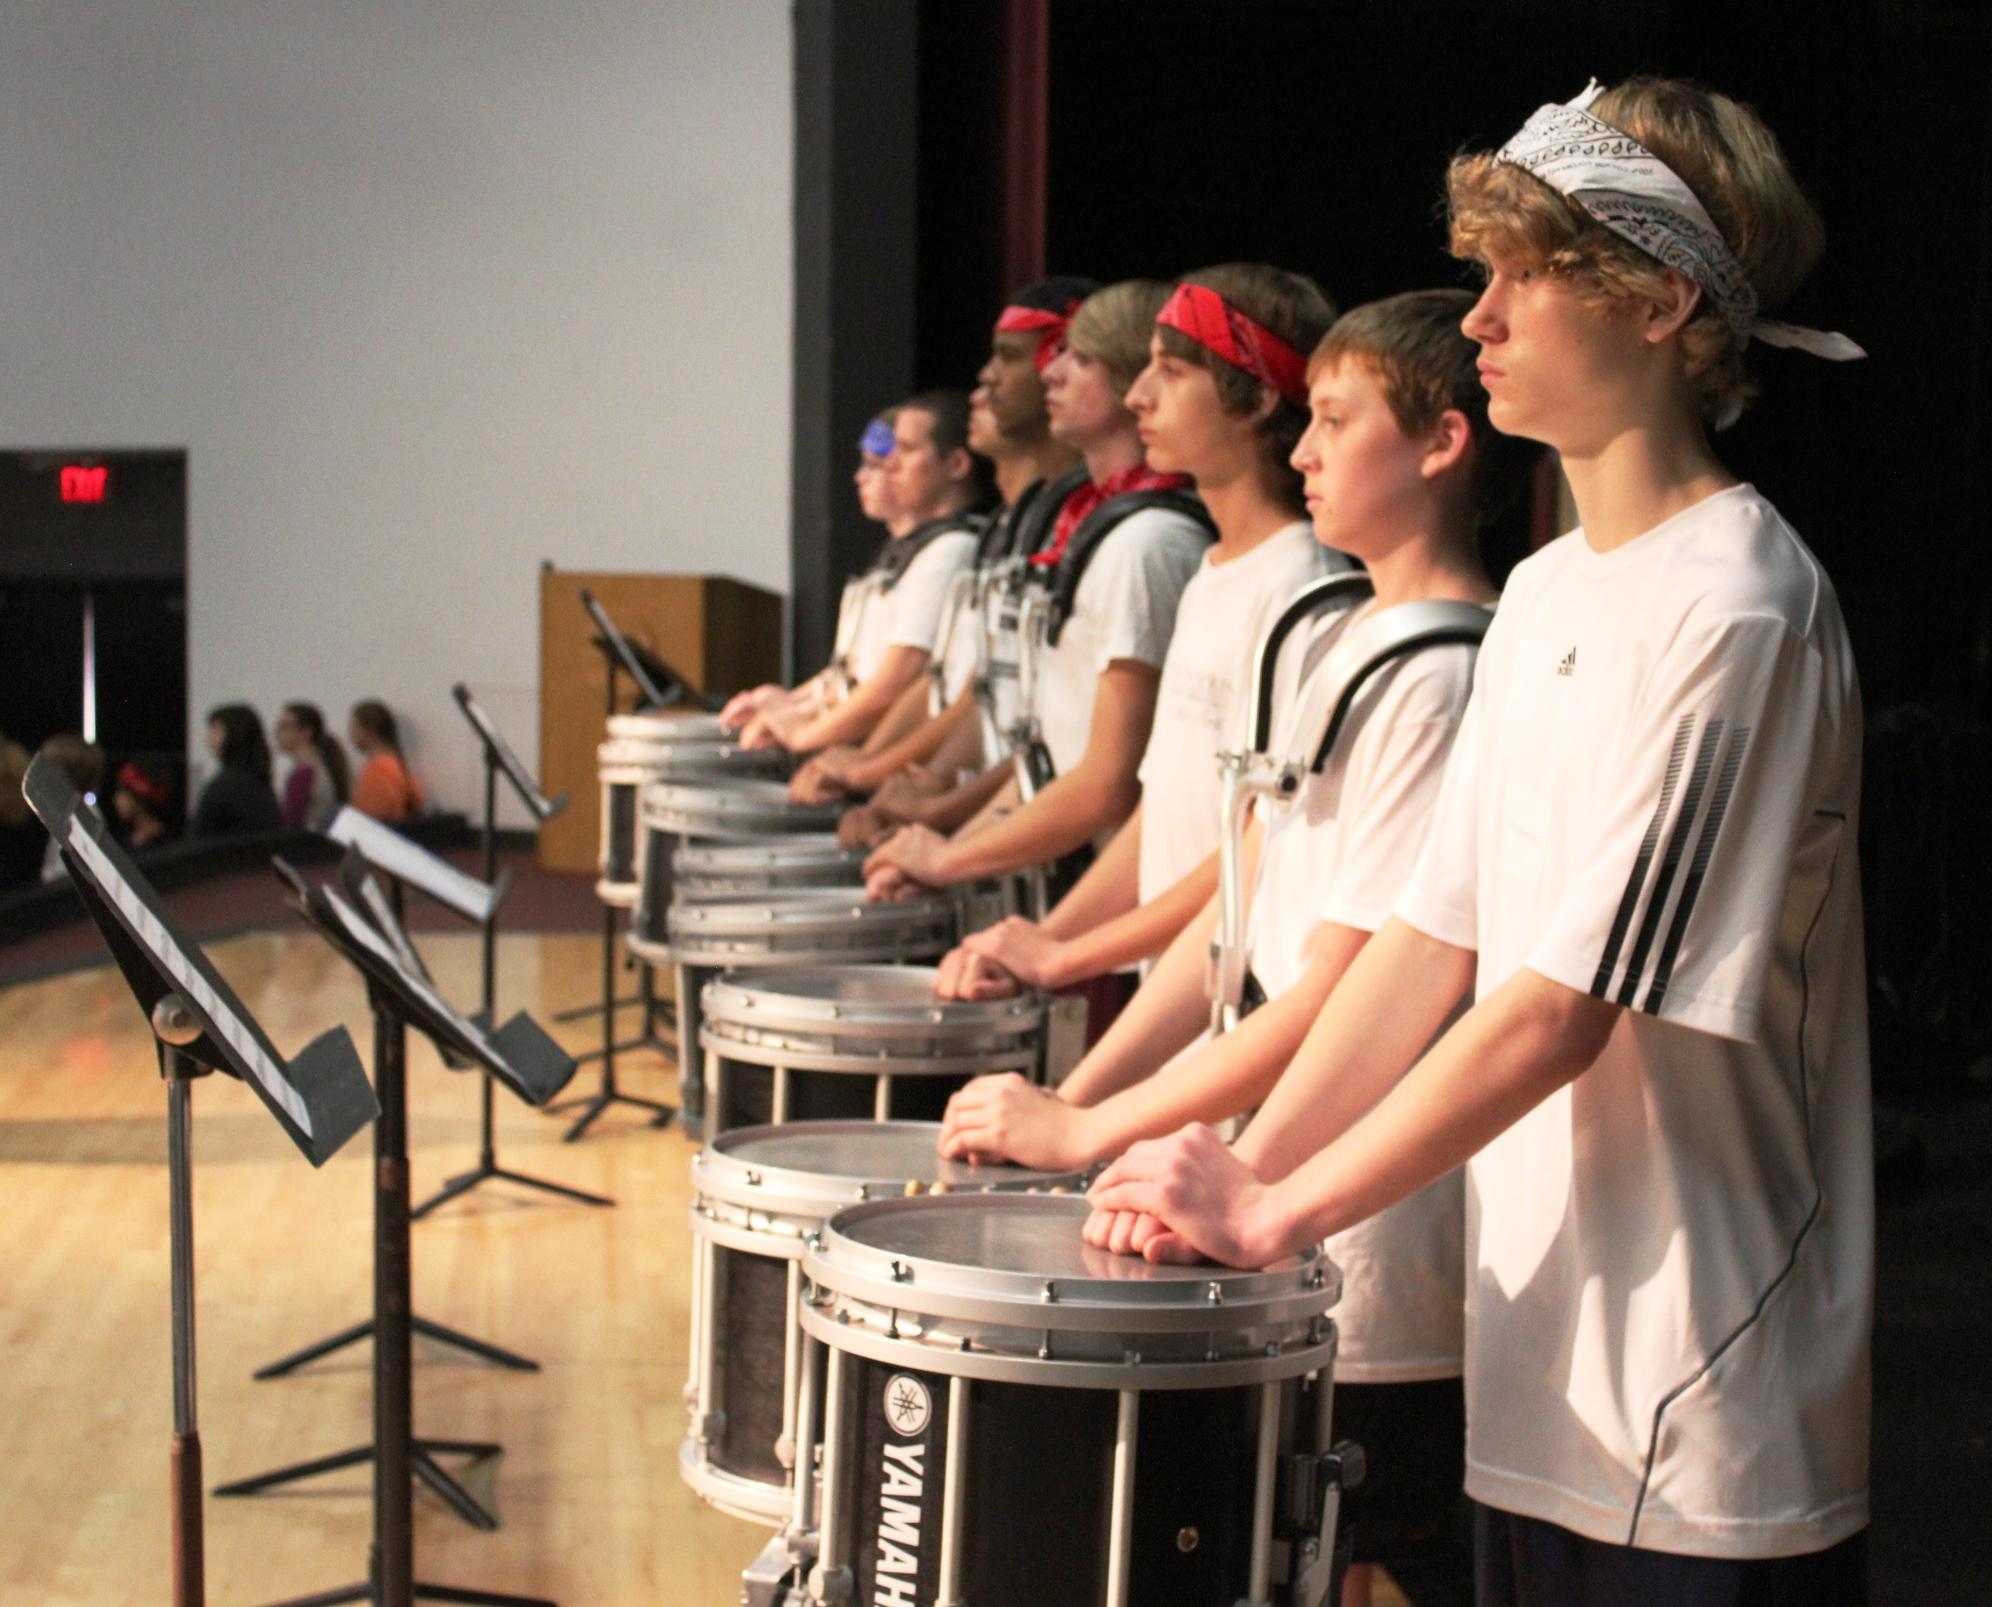 Students at Tarpon Springs High School